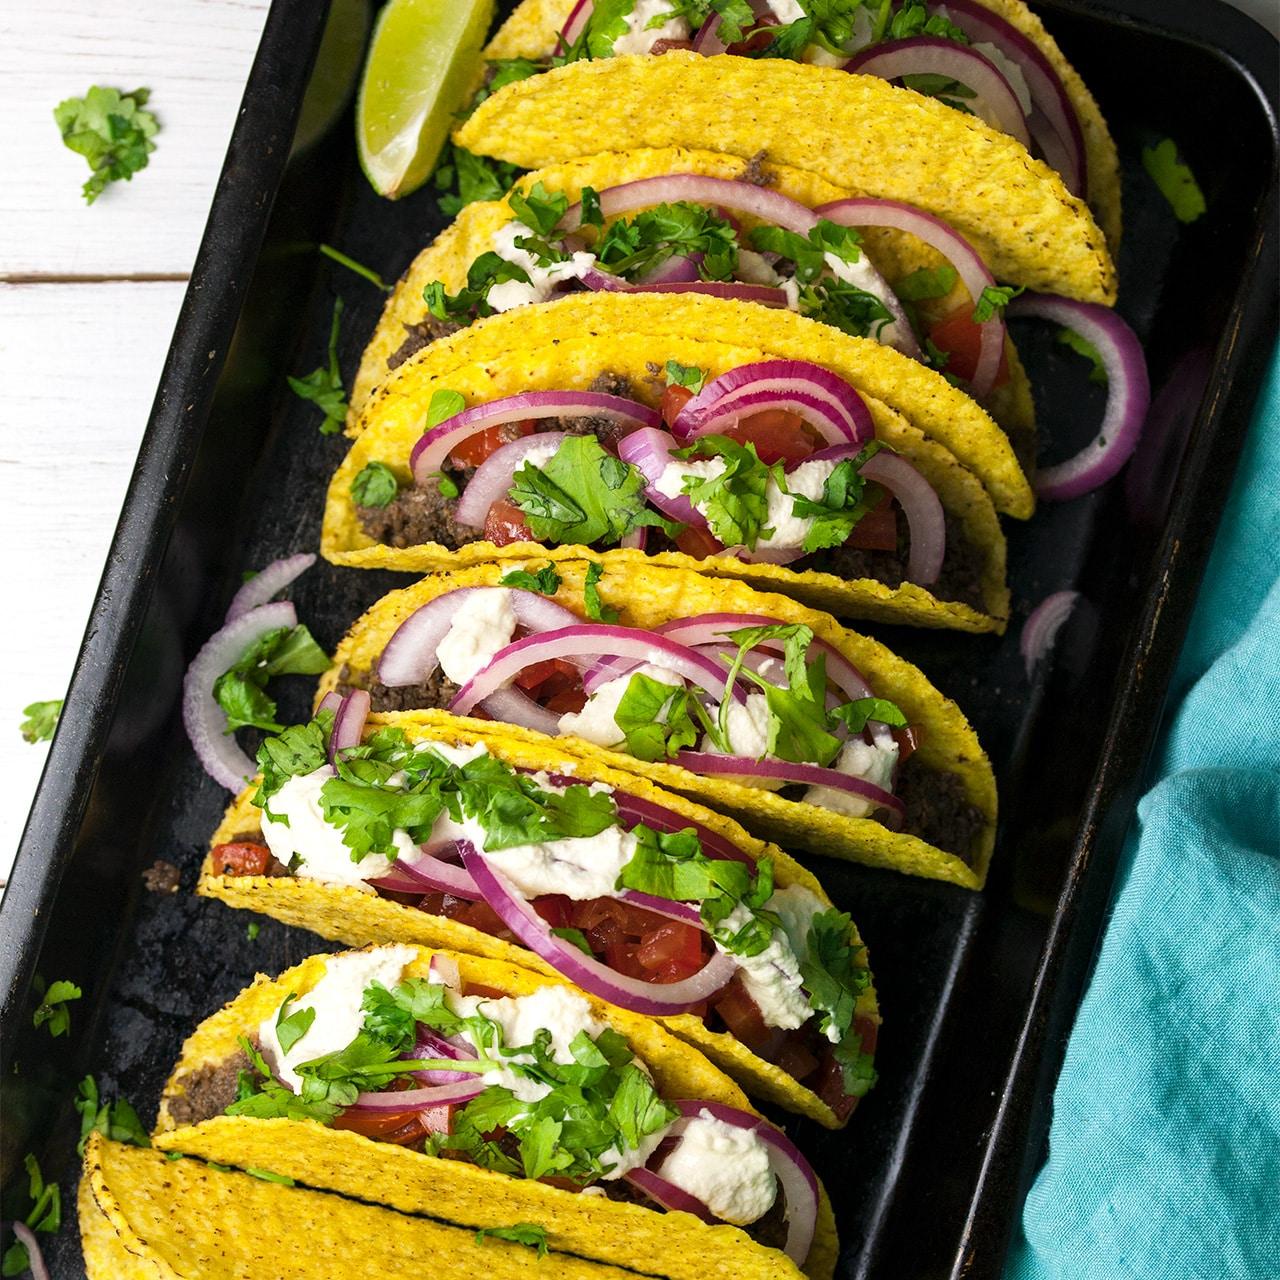 Mushroom 'Meat' Tacos